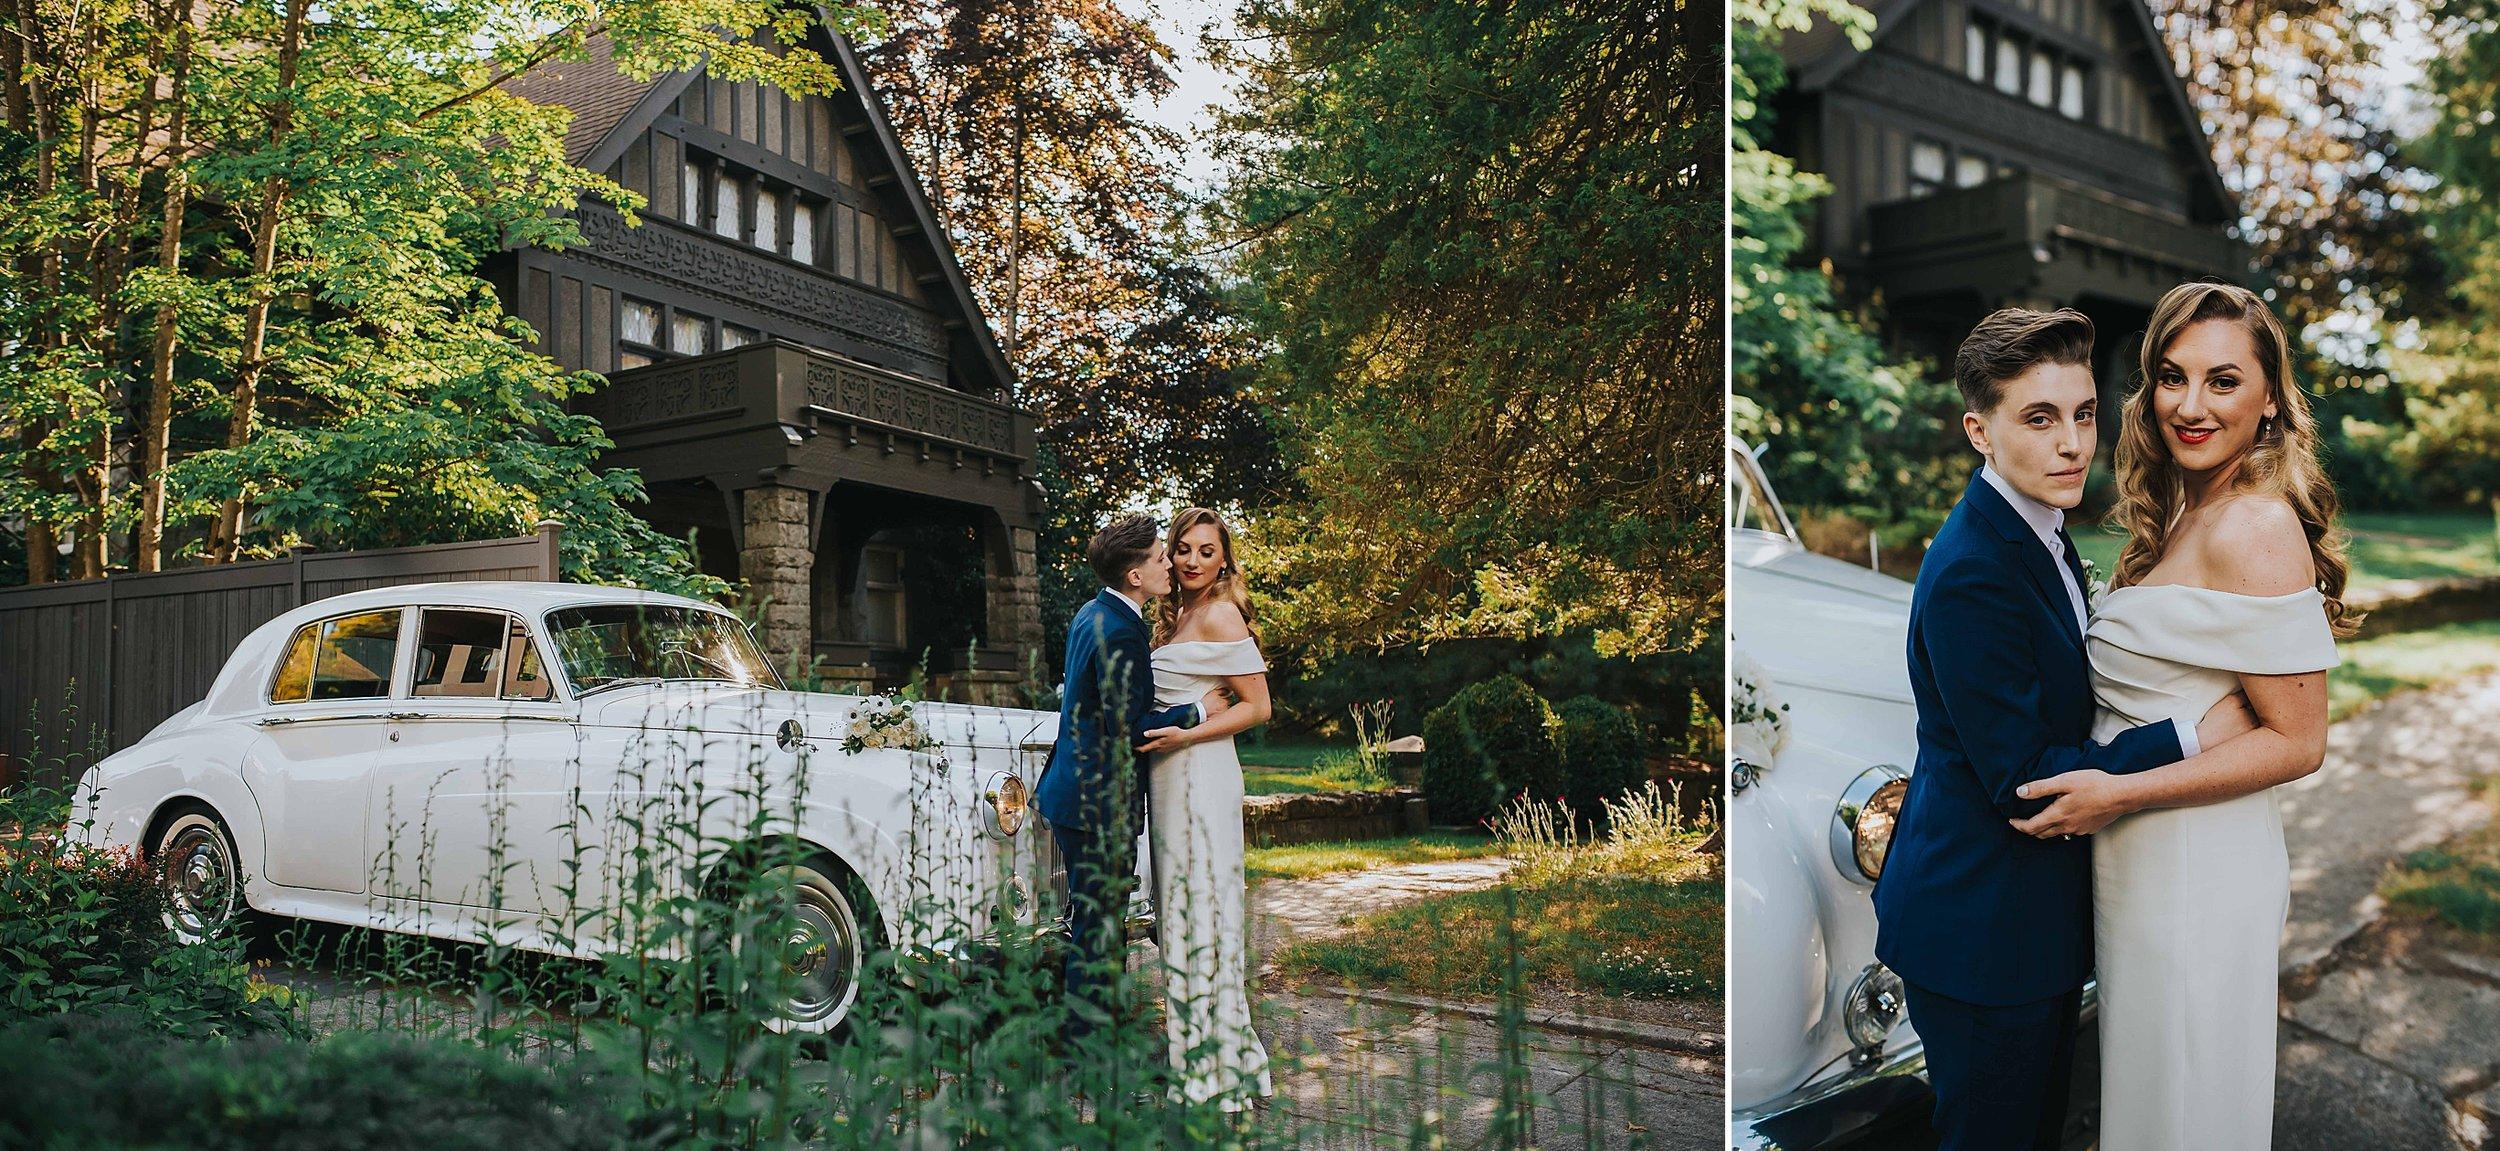 Seattle-Wedding-photographer-J HODGES PHOTOGRAPHY_0327.jpg